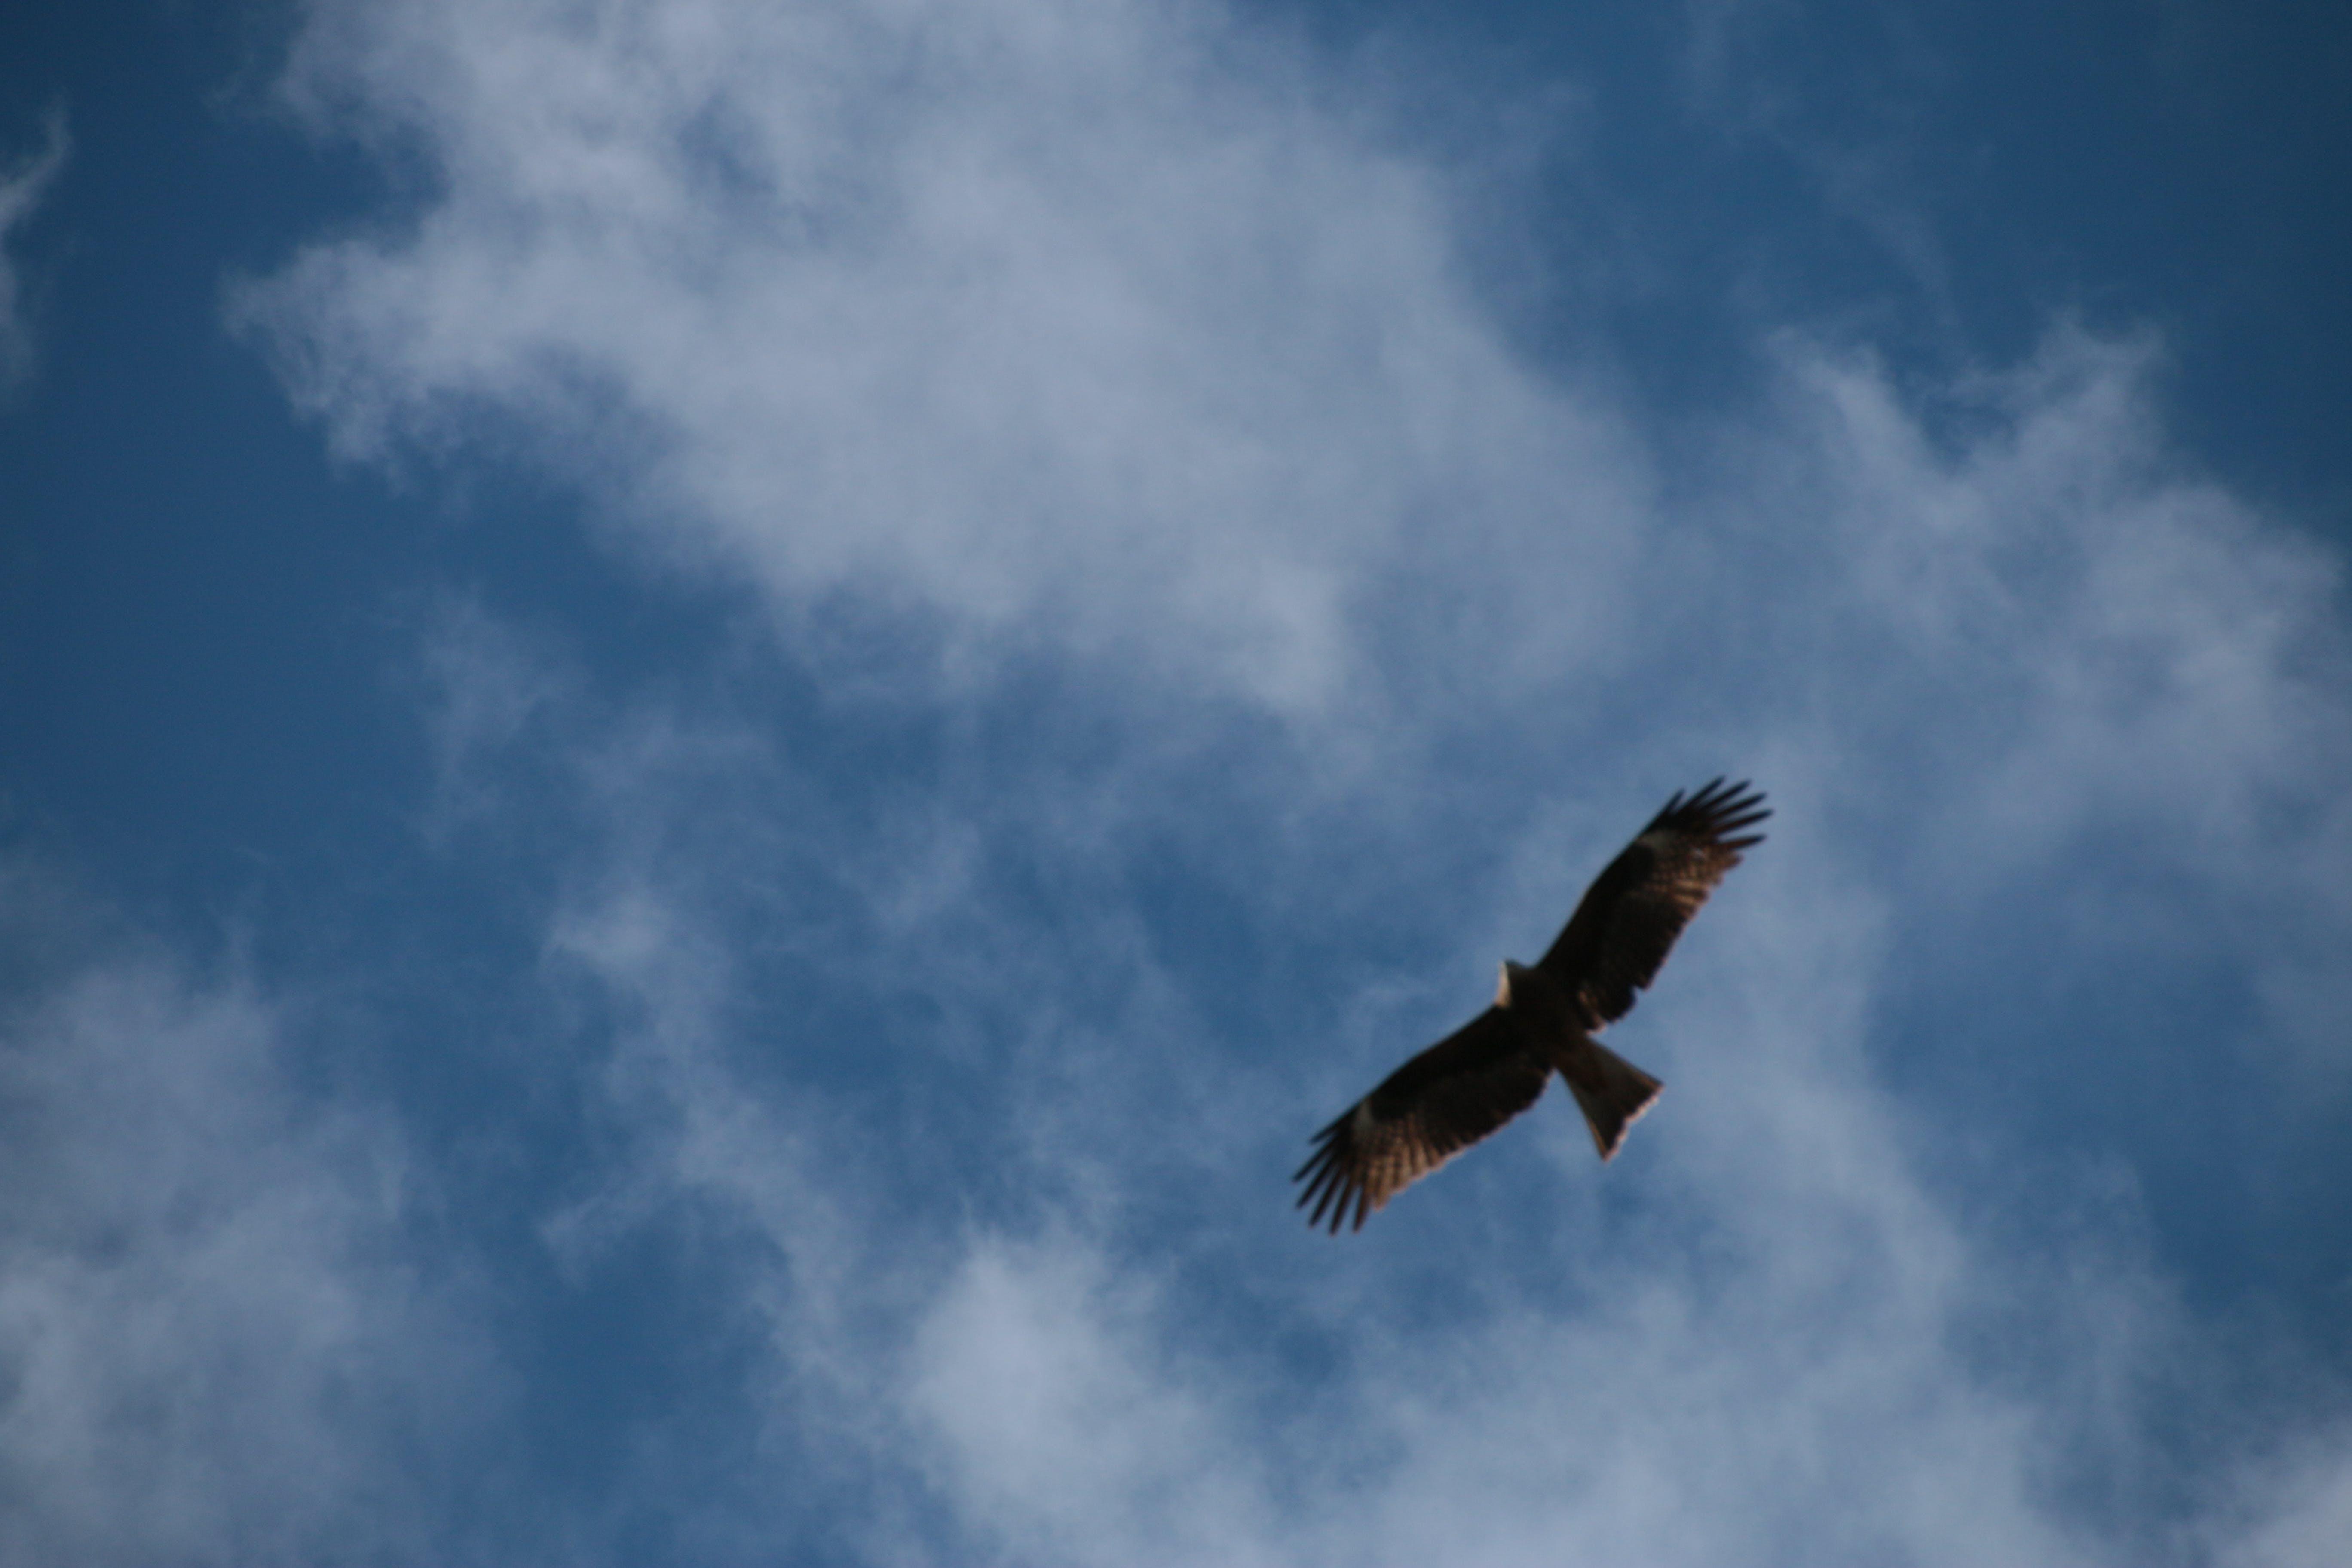 Free stock photo of eagle